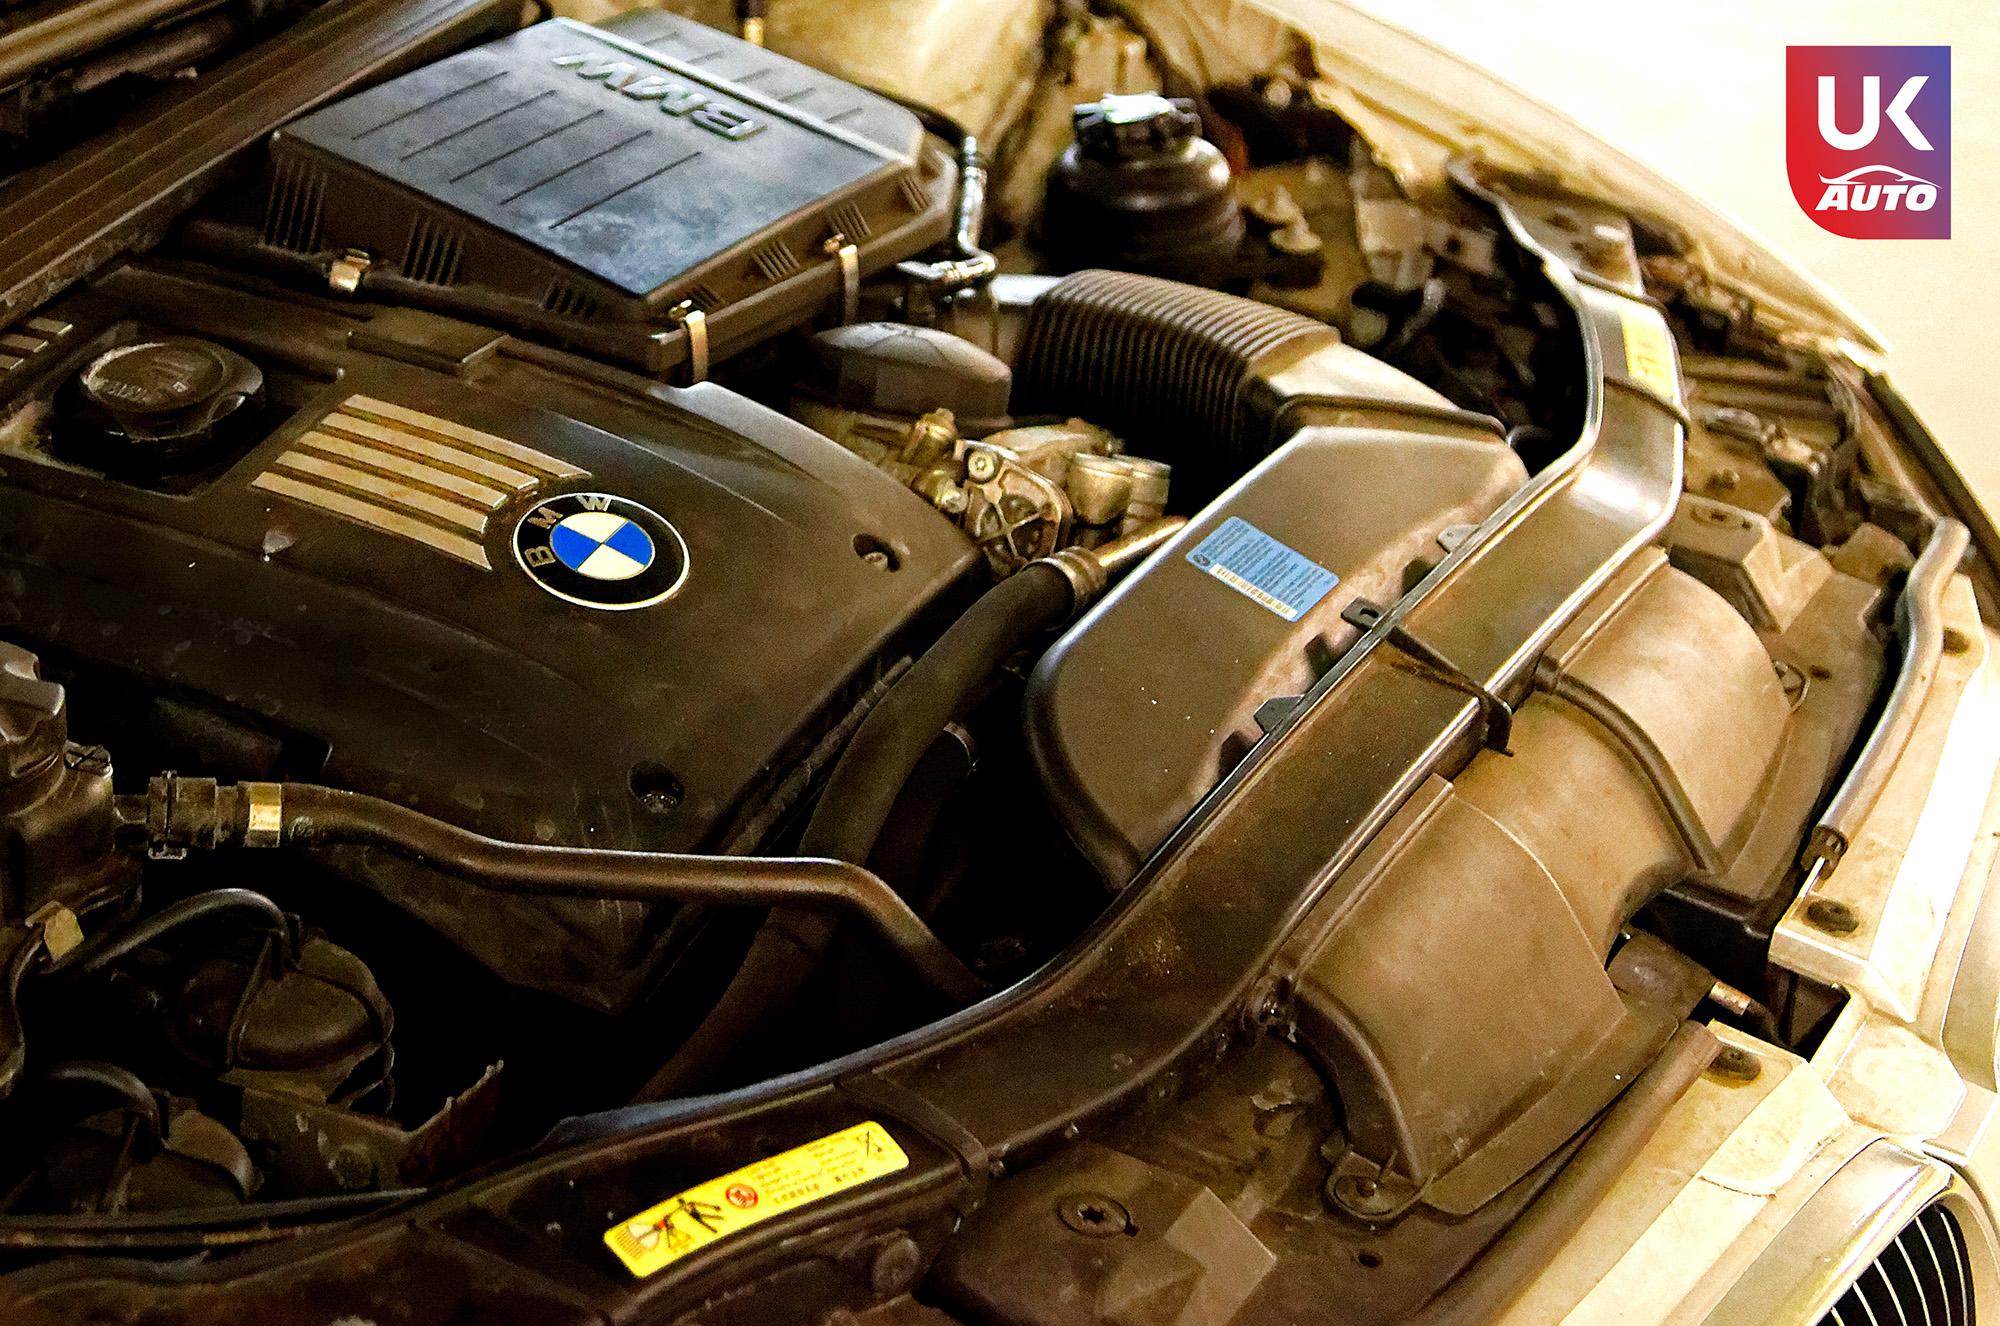 Bmw 335i rhd import uk bmw occasion bmw mandataire e92 rhd coupe uk auto uk ukauto12 - Felecitation a Julien pour cette BMW 335i E92 COUPE RHD importateur voitures anglaises